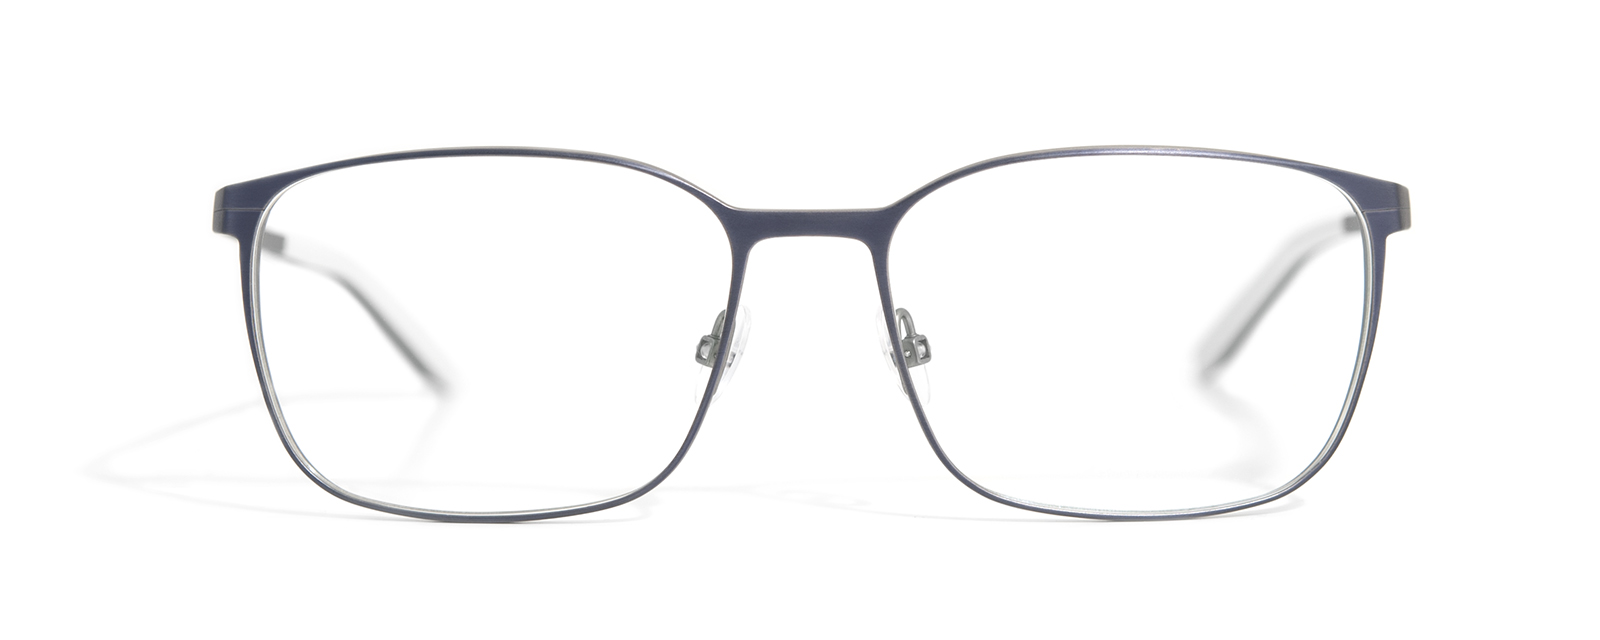 Götti Titan Brille in München